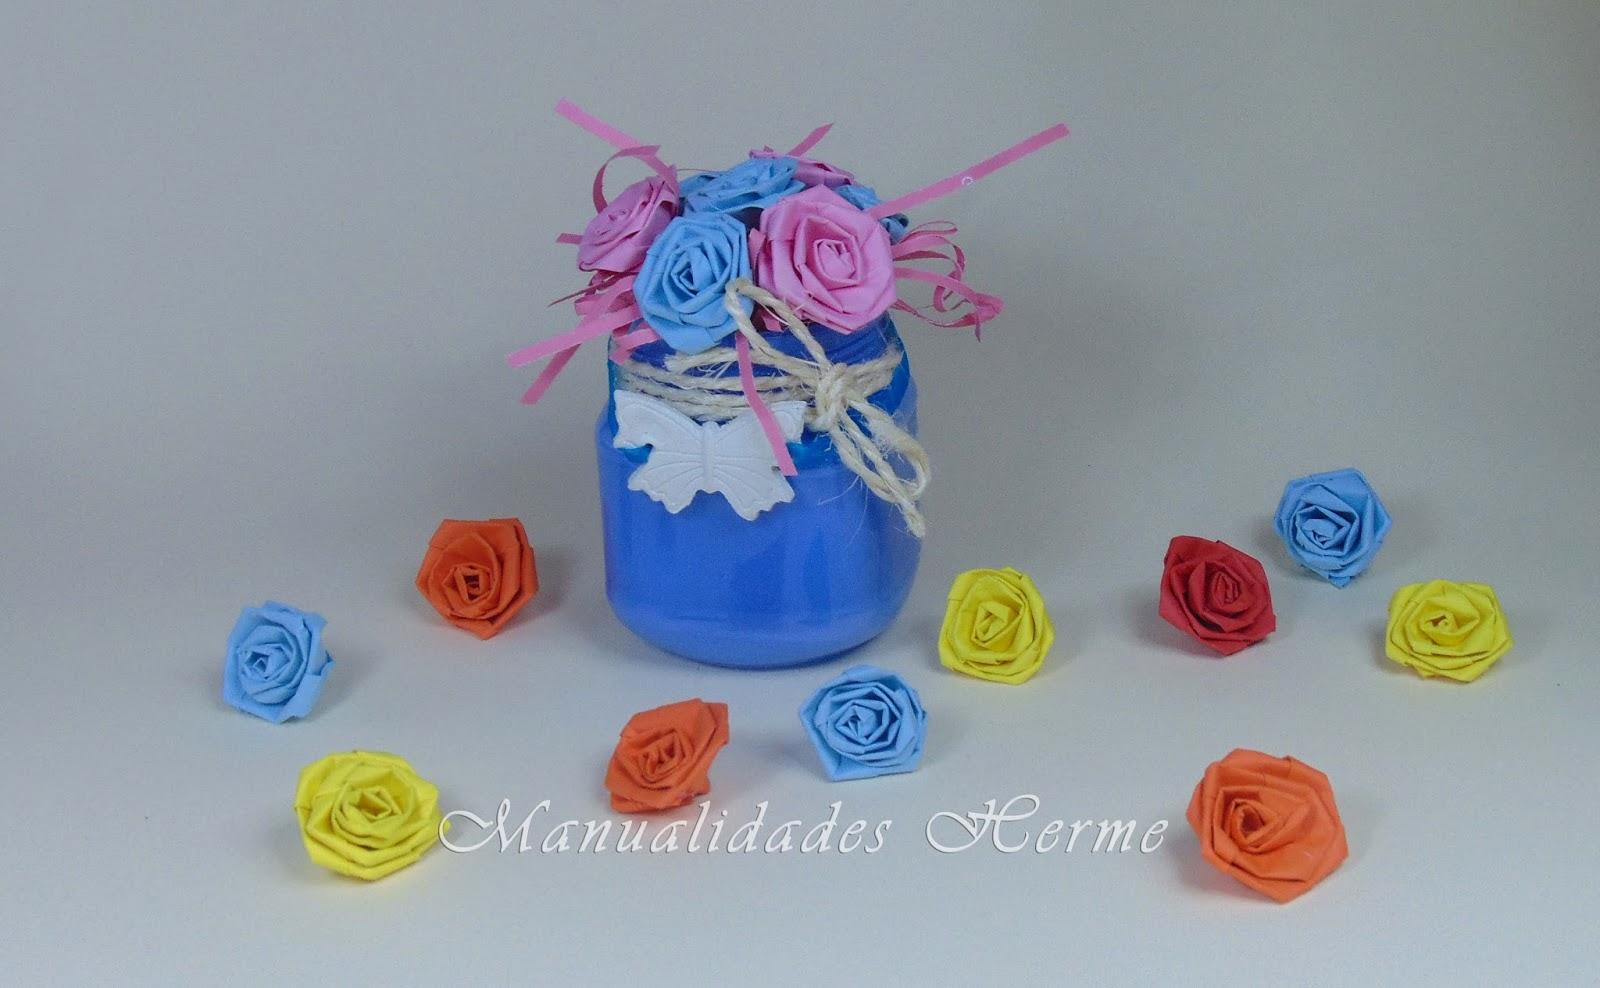 Como hacer flores con papel Crepe Todo Manualidades - Imagenes De Flores De Papel Paso A Paso